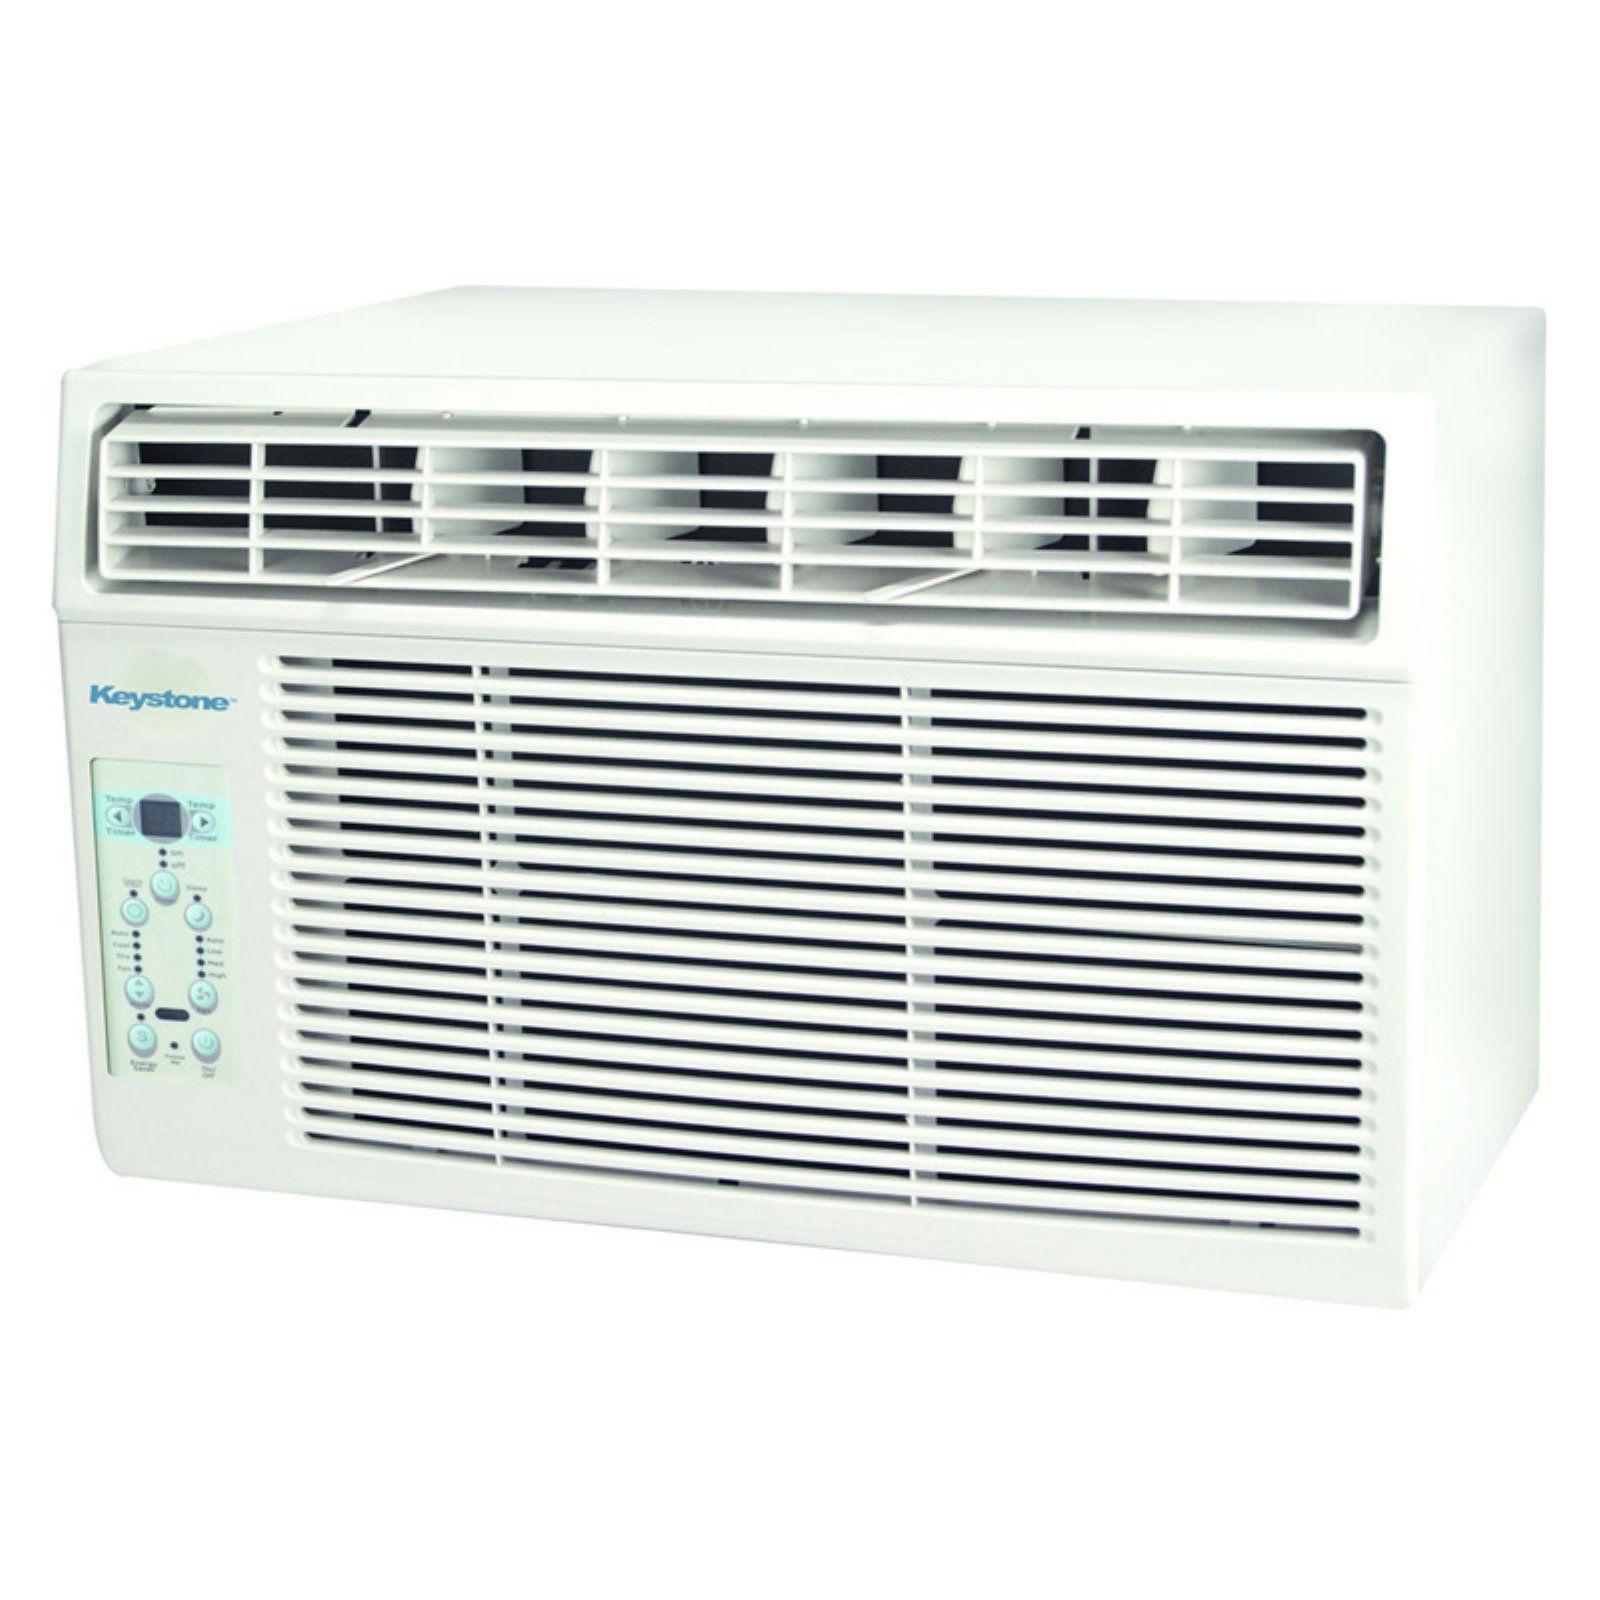 Keystone Kstaw06c Energy Star Window Air Conditioner Window Air